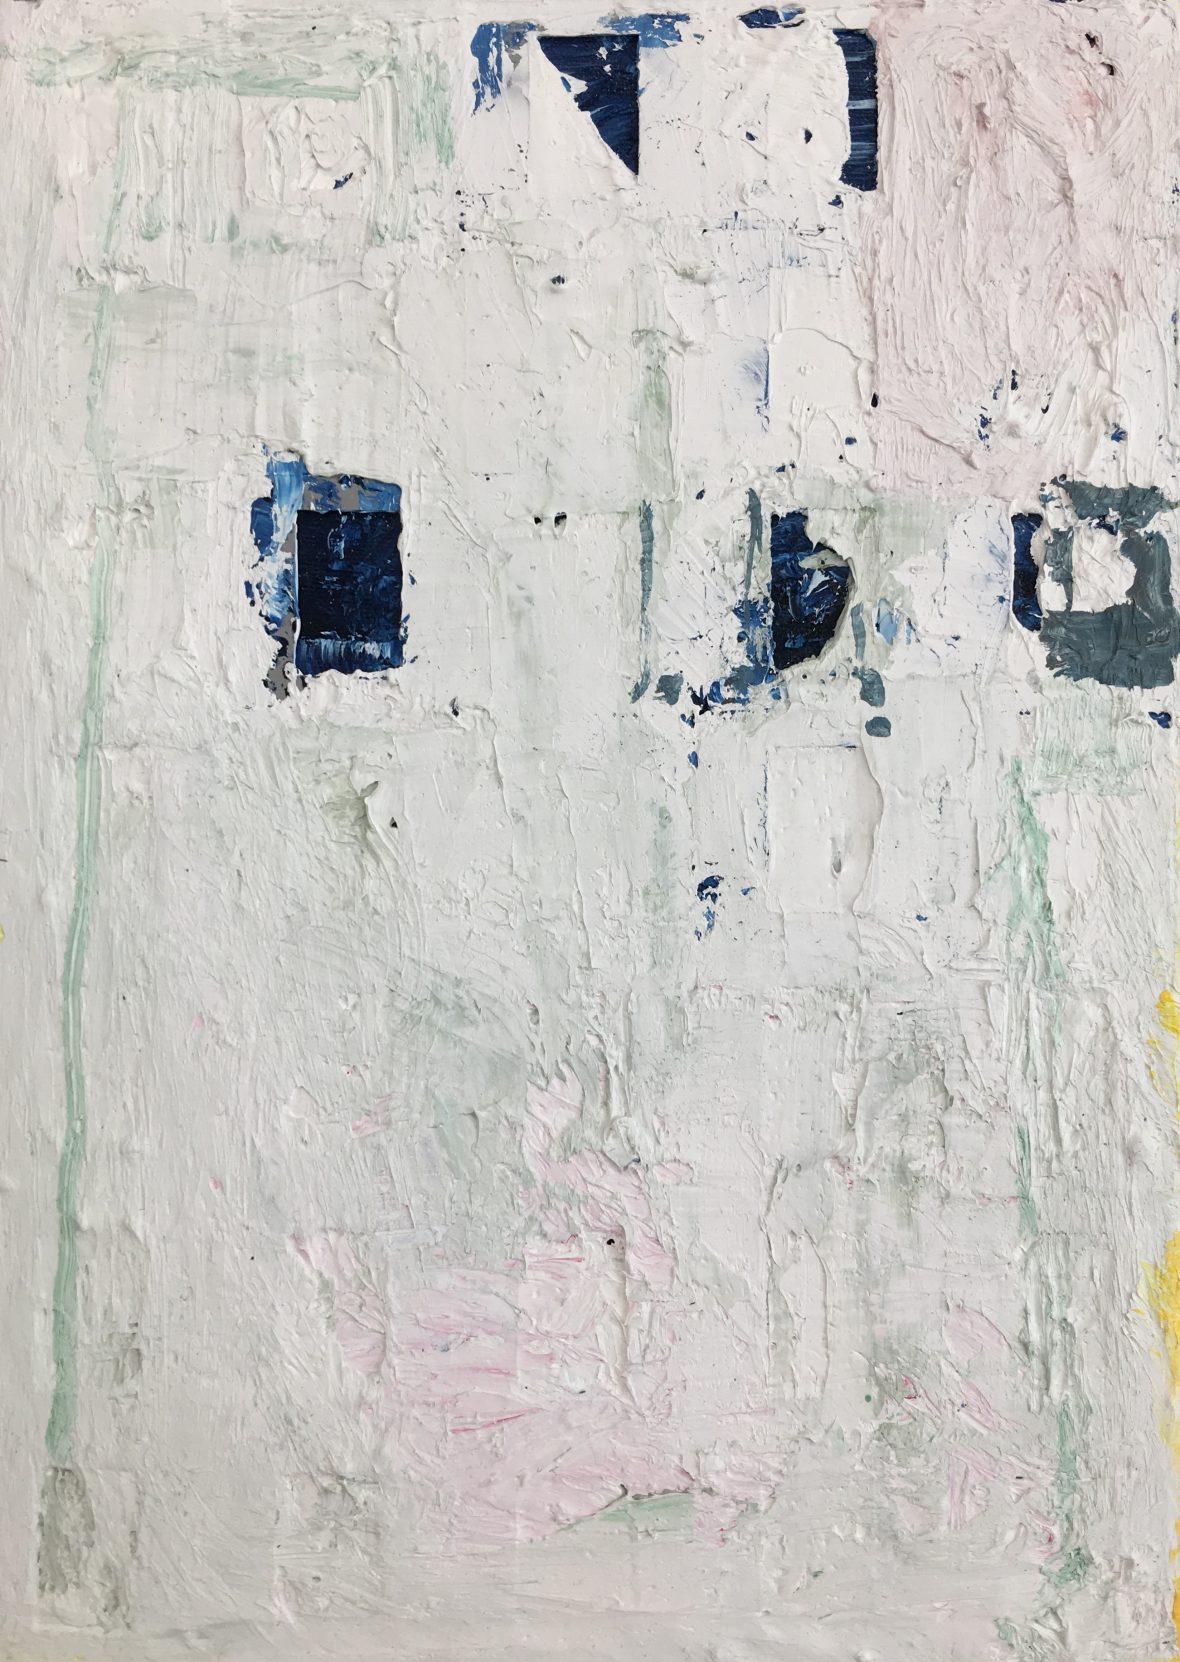 Painting / Maalaus / Målning 35 x 25 cm, 2018